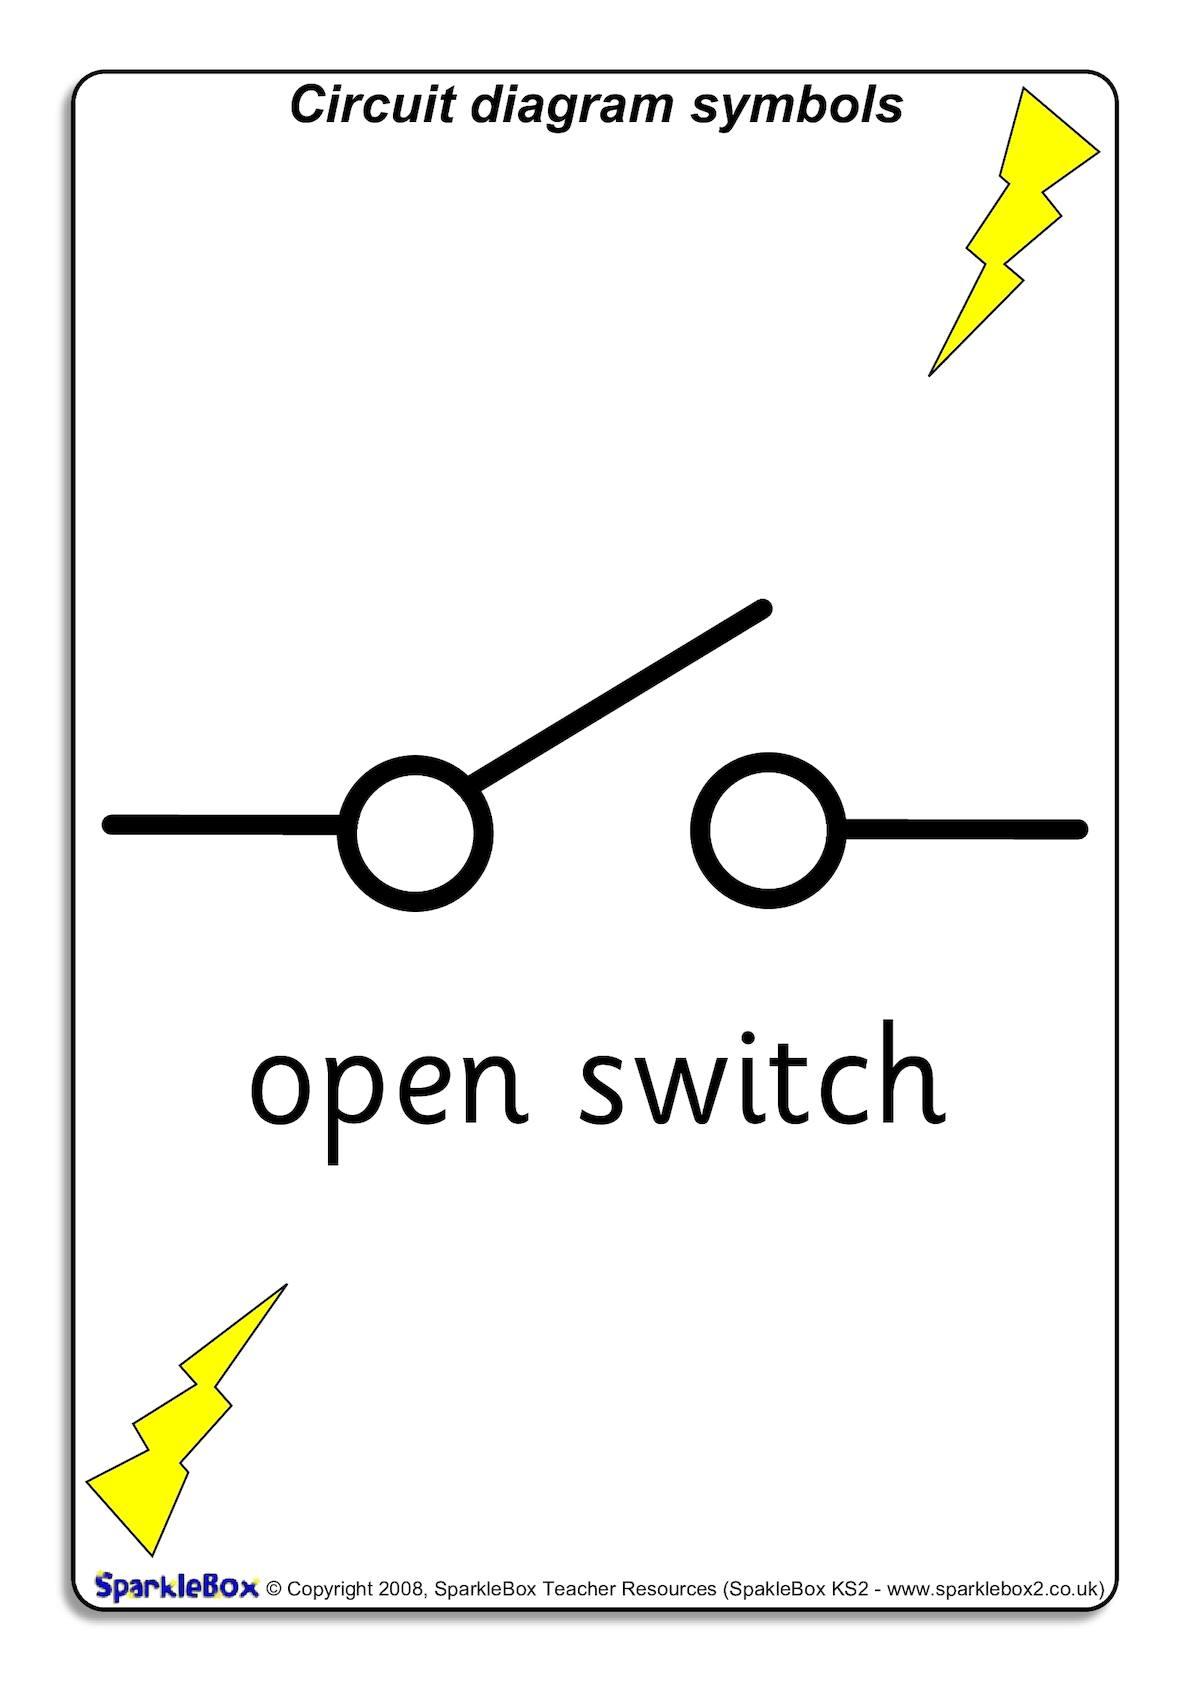 Surprising Wrg 9367 Circuit Diagram Ks2 Wiring Digital Resources Funiwoestevosnl